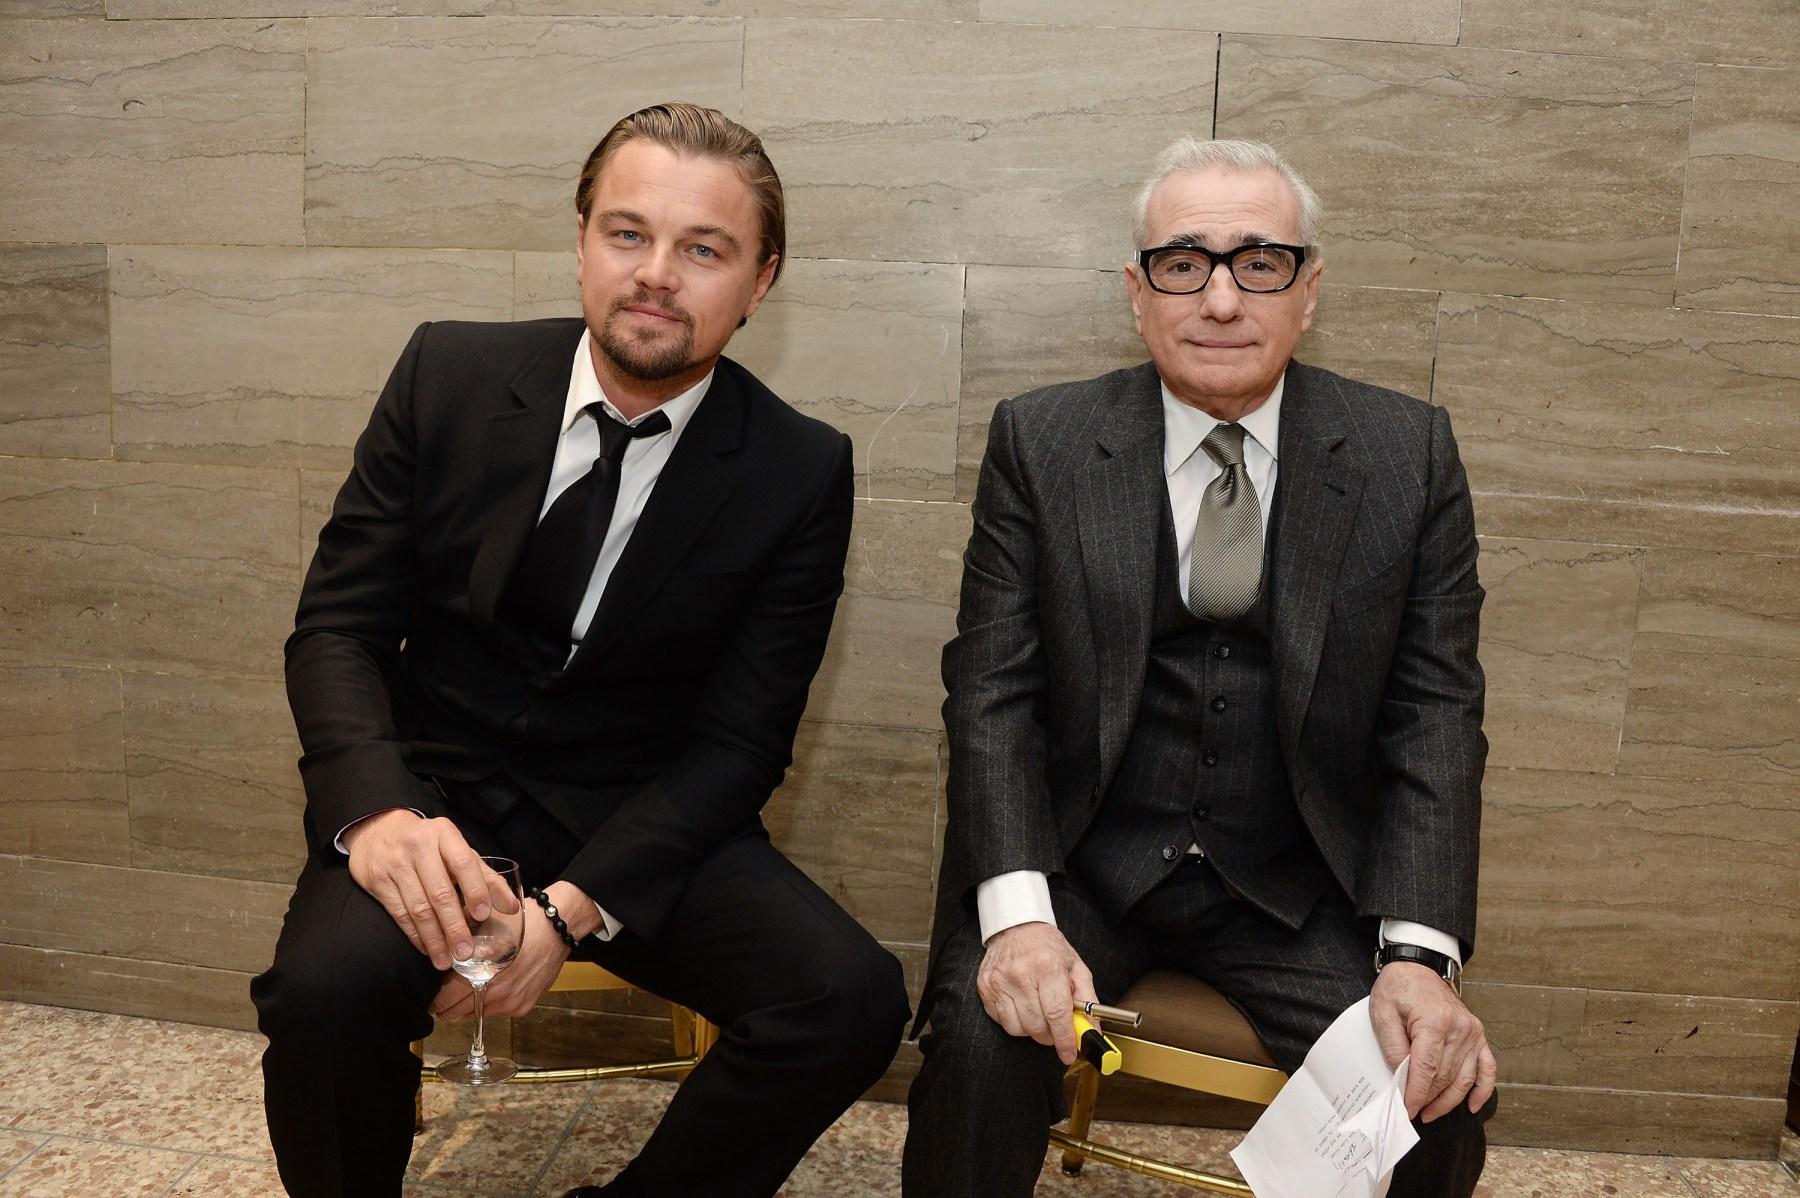 DiCaprio and Scorsese